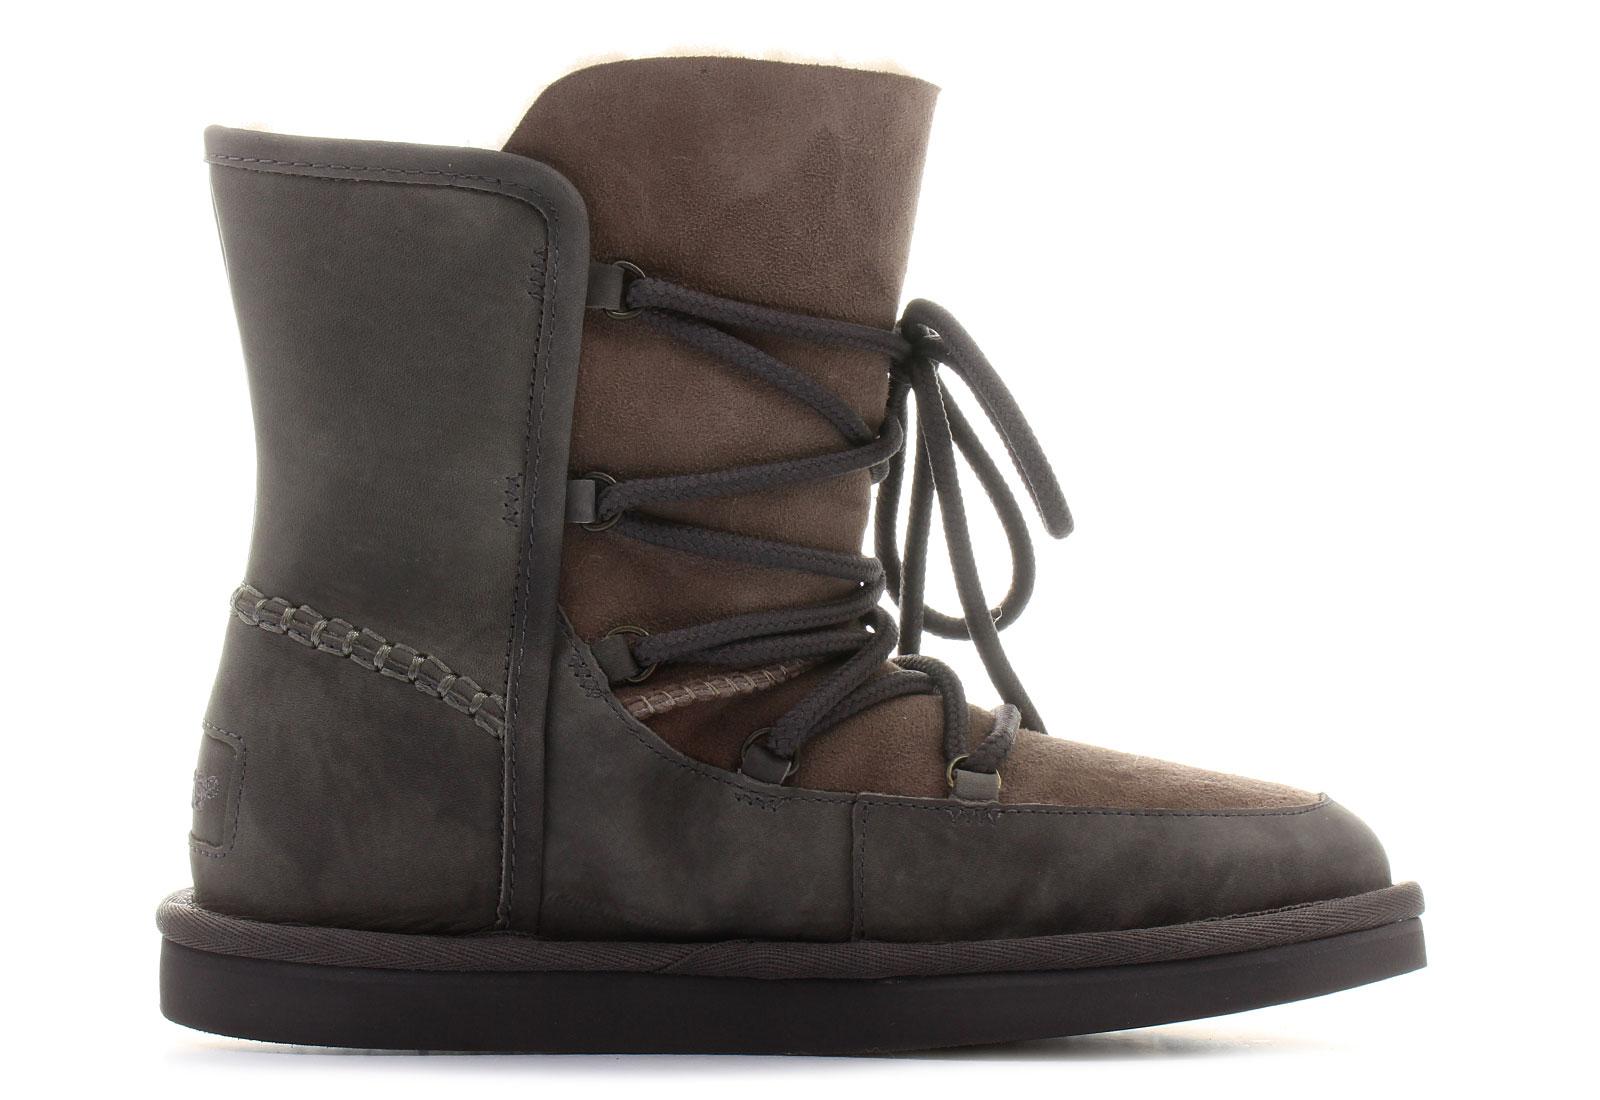 2e6364fabcb Ozwear Ugg Eva Premium Sheepskin Wedge Boots